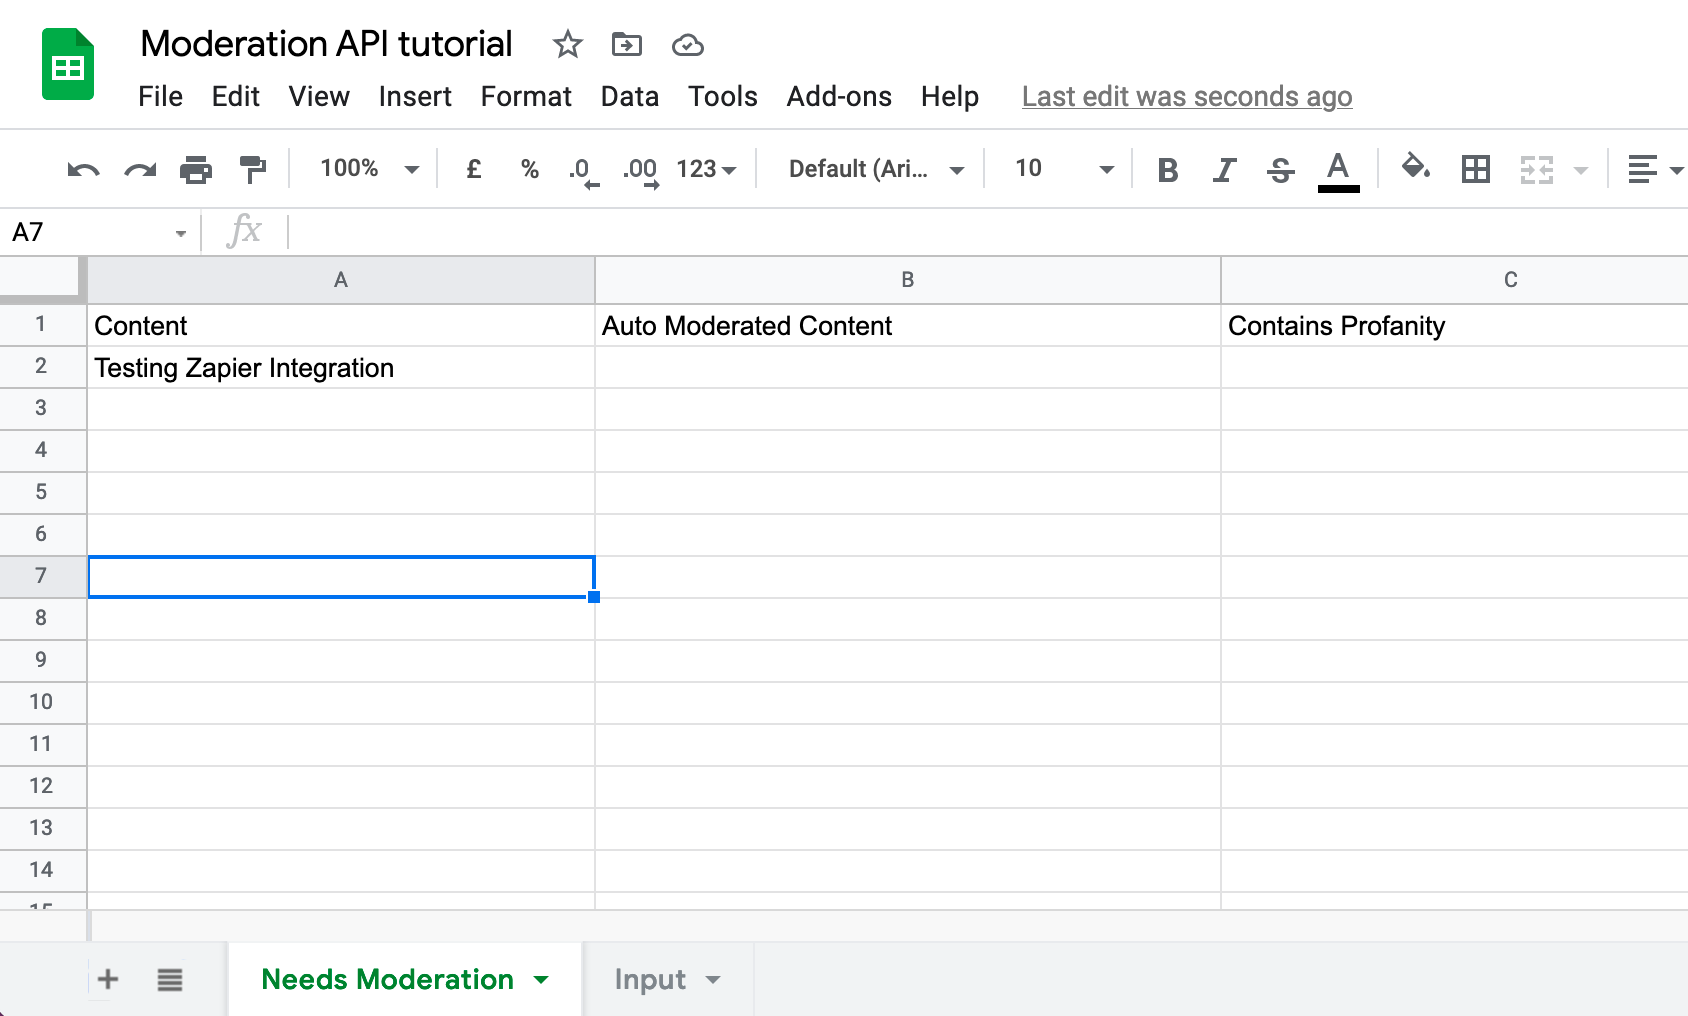 Google Sheet prepared for Moderation